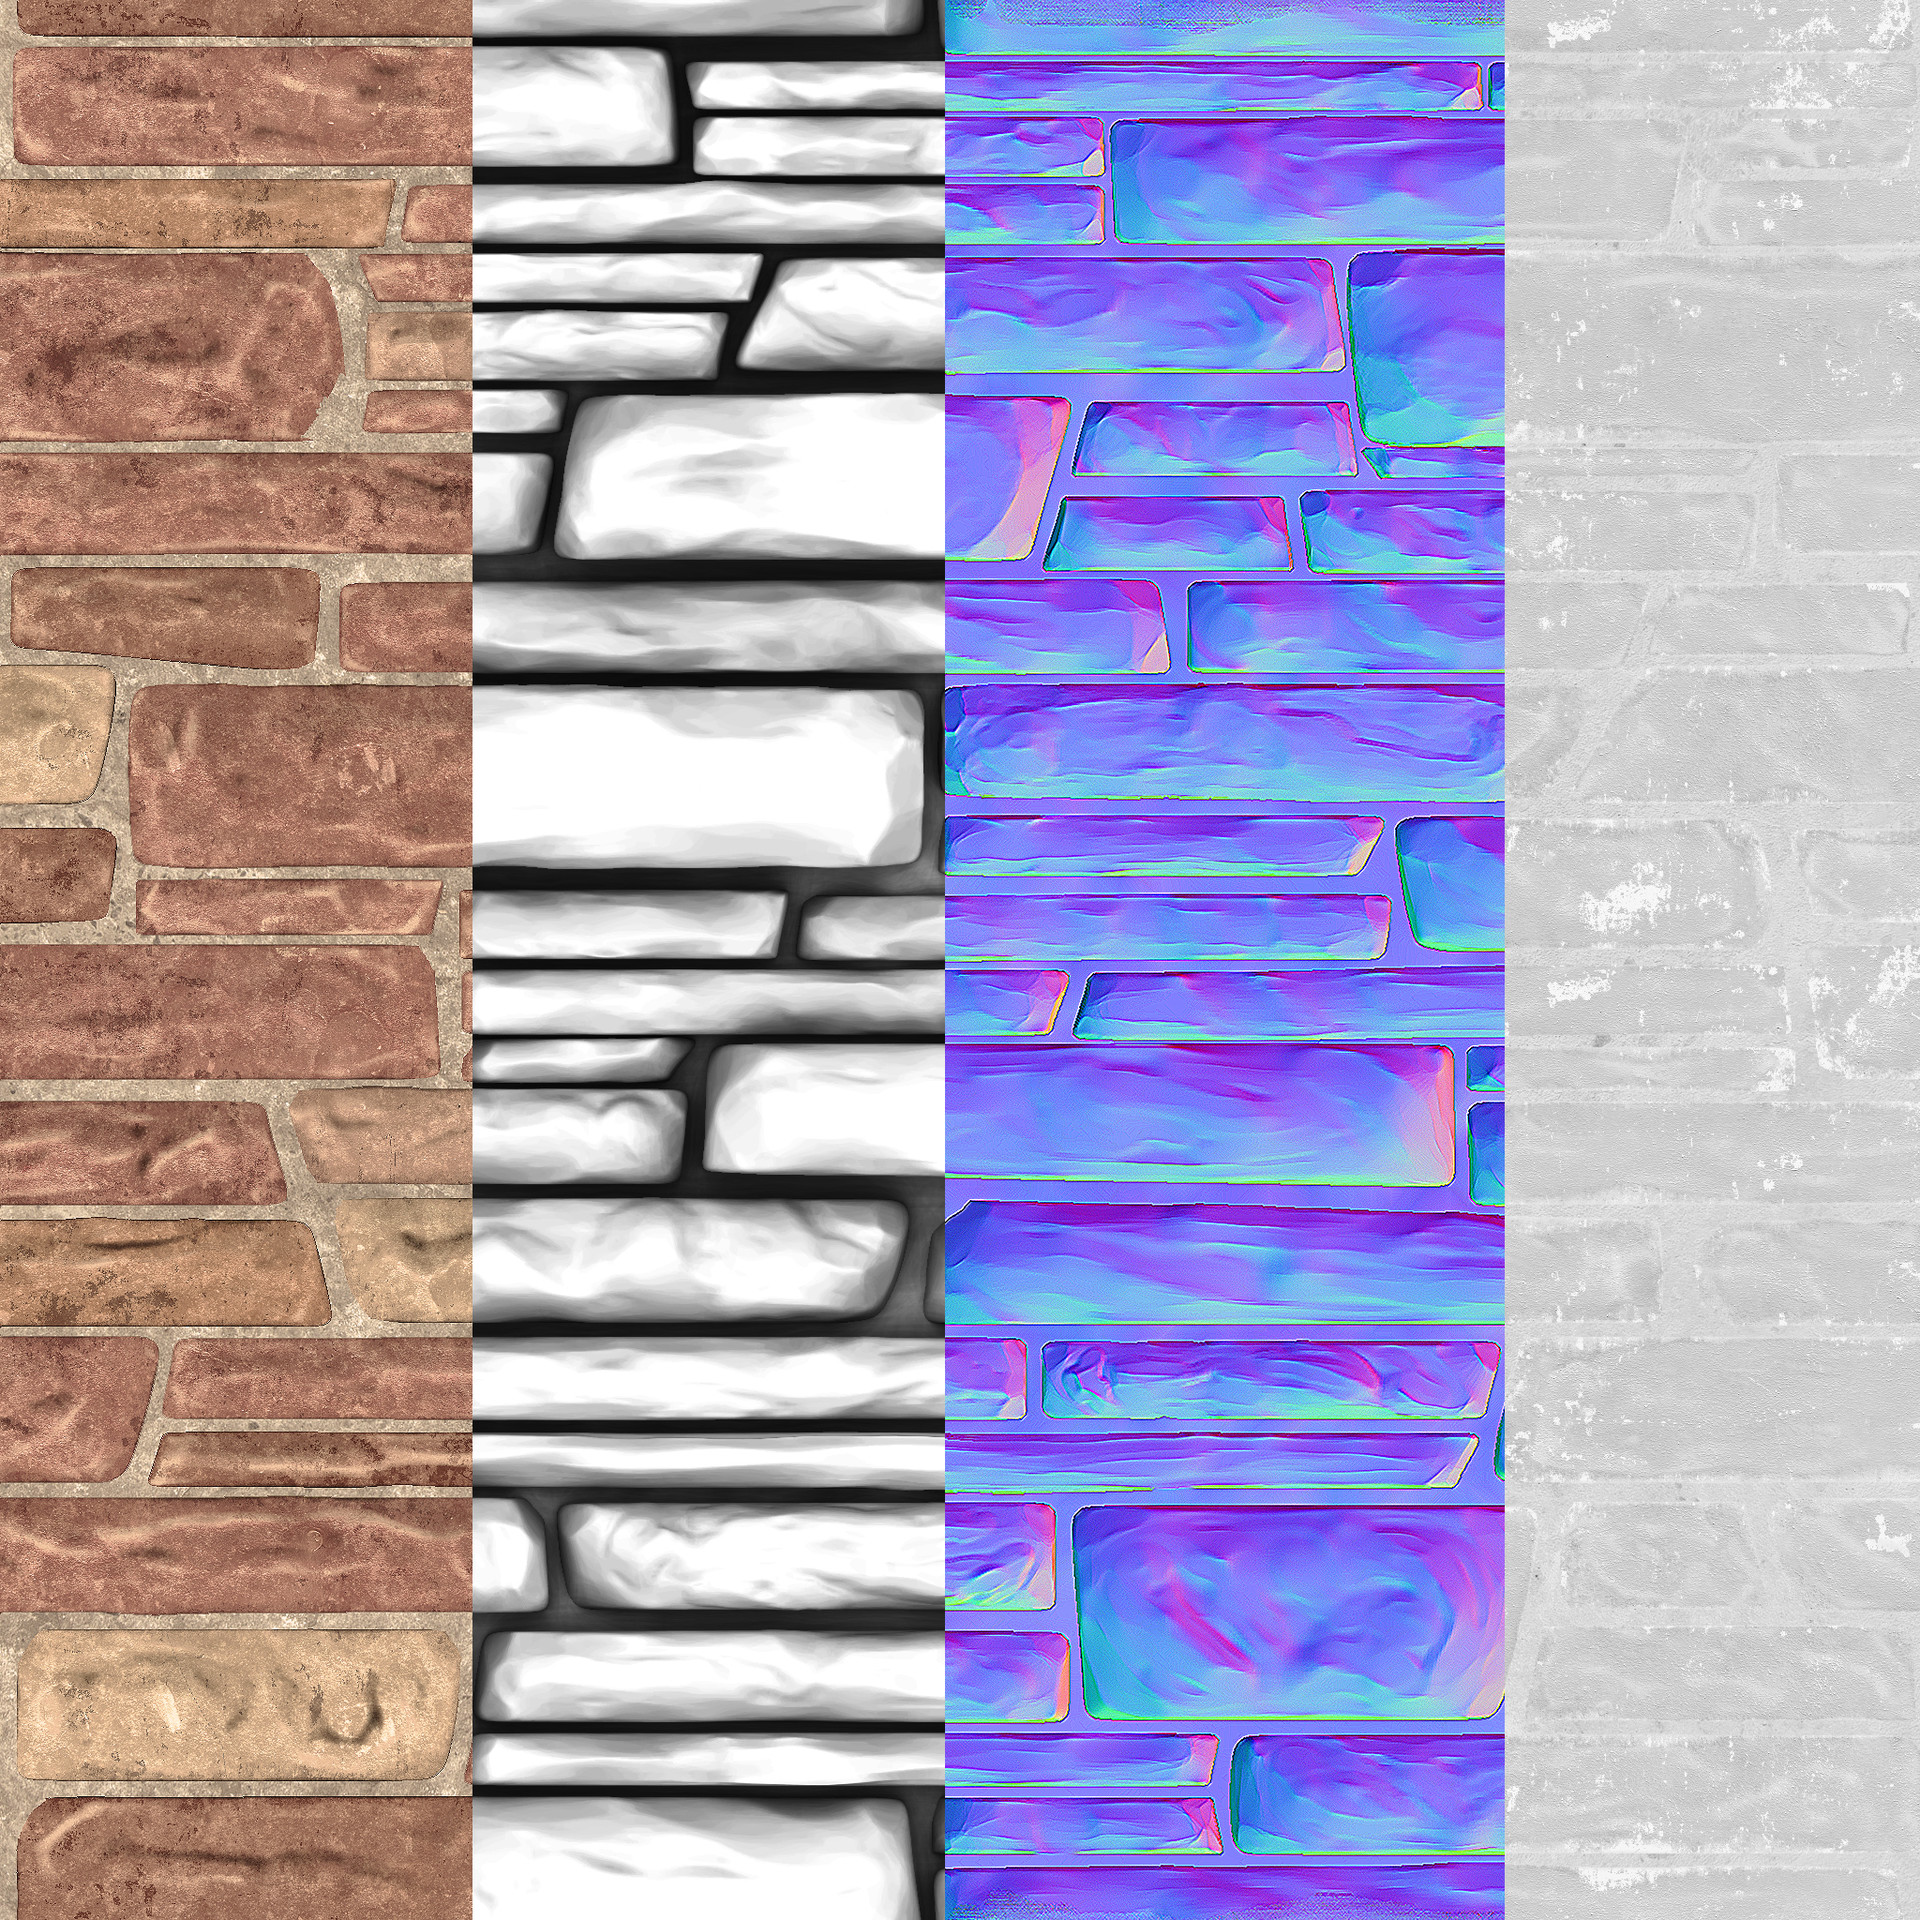 Trevor sedgwick stone texture